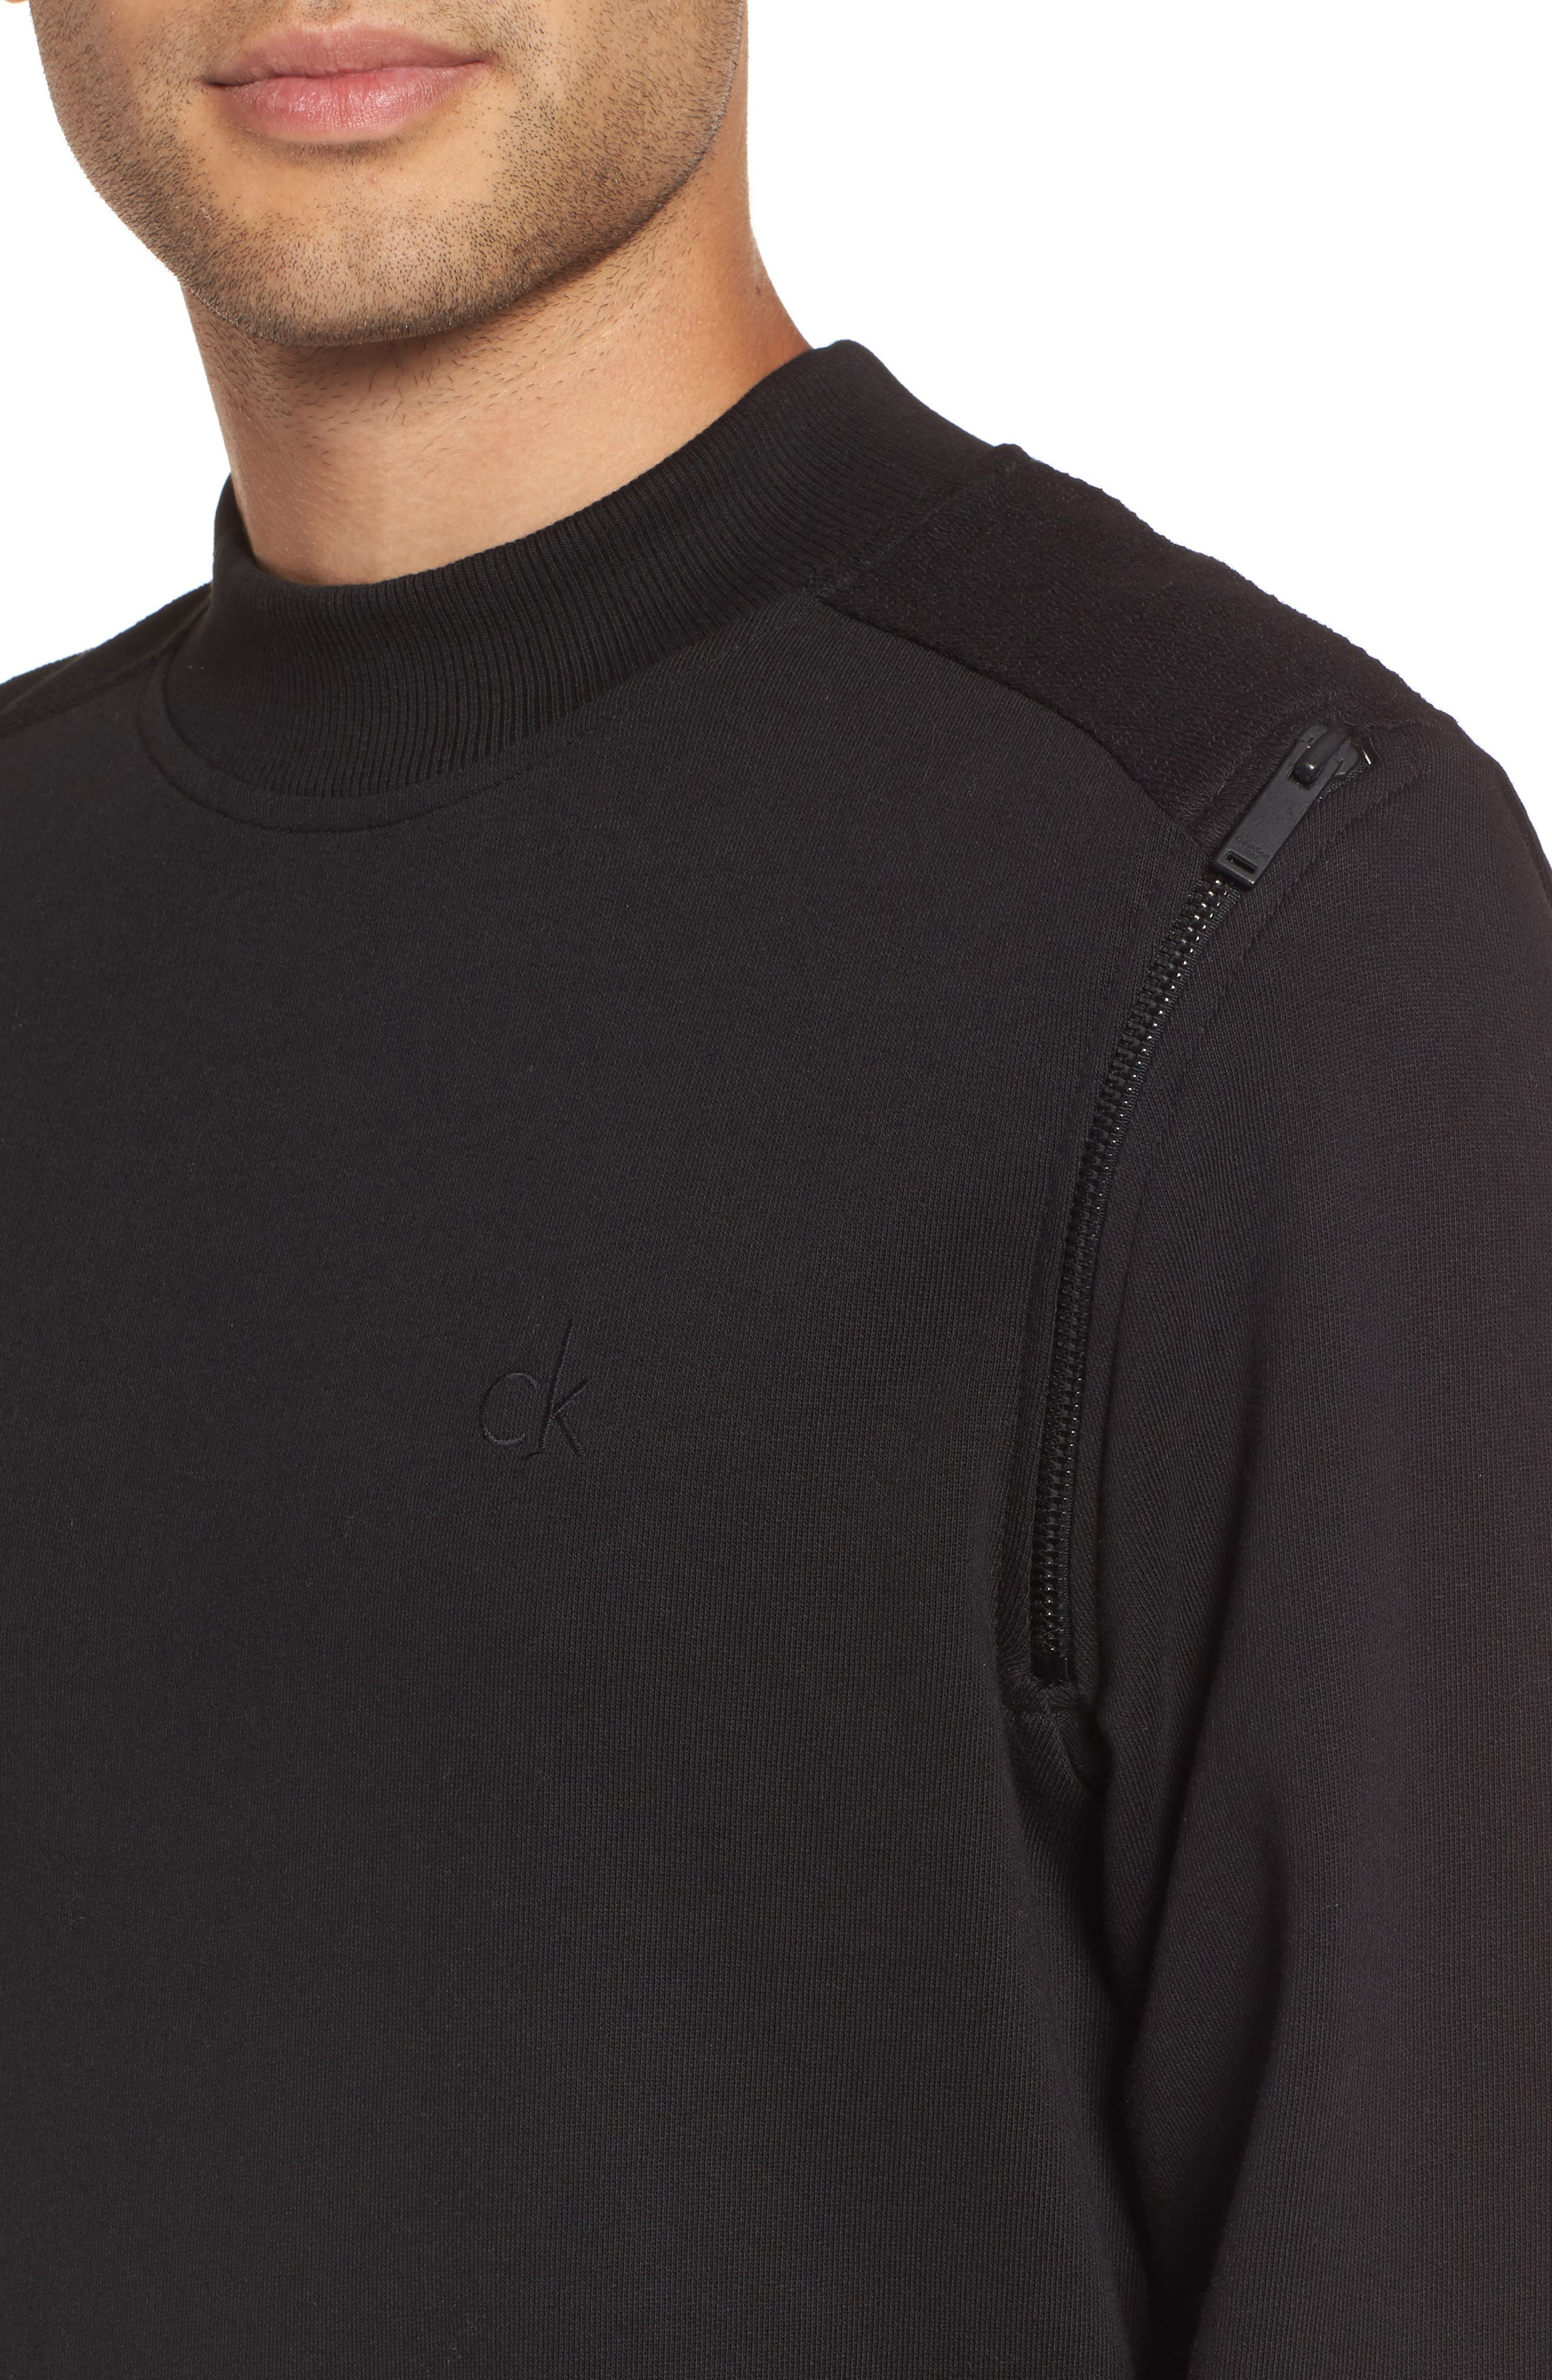 Zip Shoulder Sweatshirt,                             Alternate thumbnail 4, color,                             010